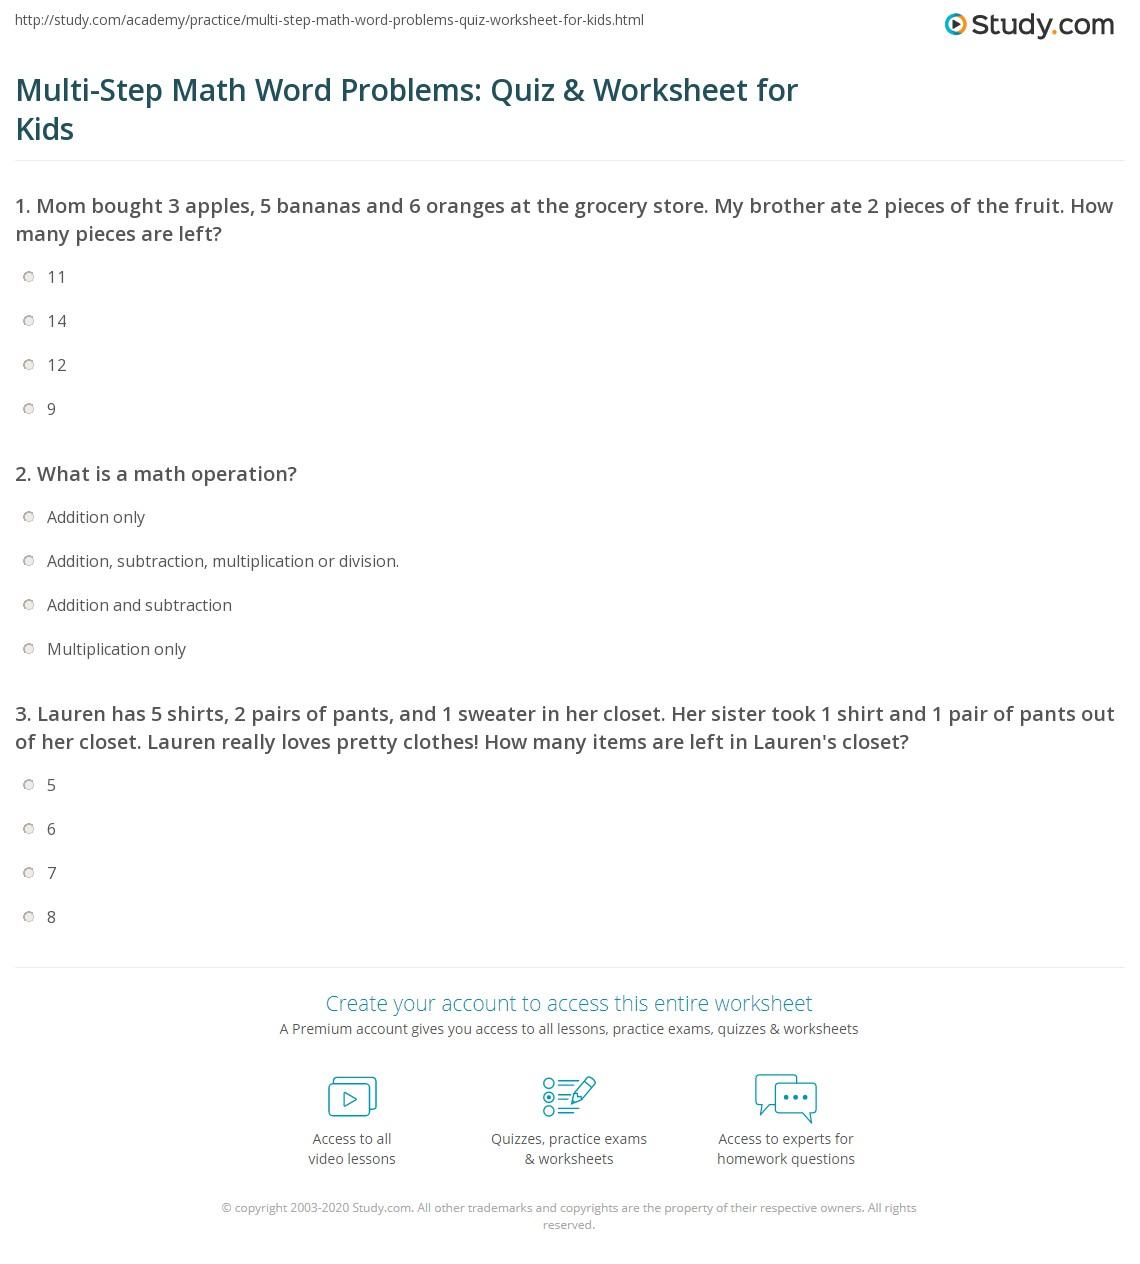 Multi-Step Math Word Problems: Quiz & Worksheet for Kids ...